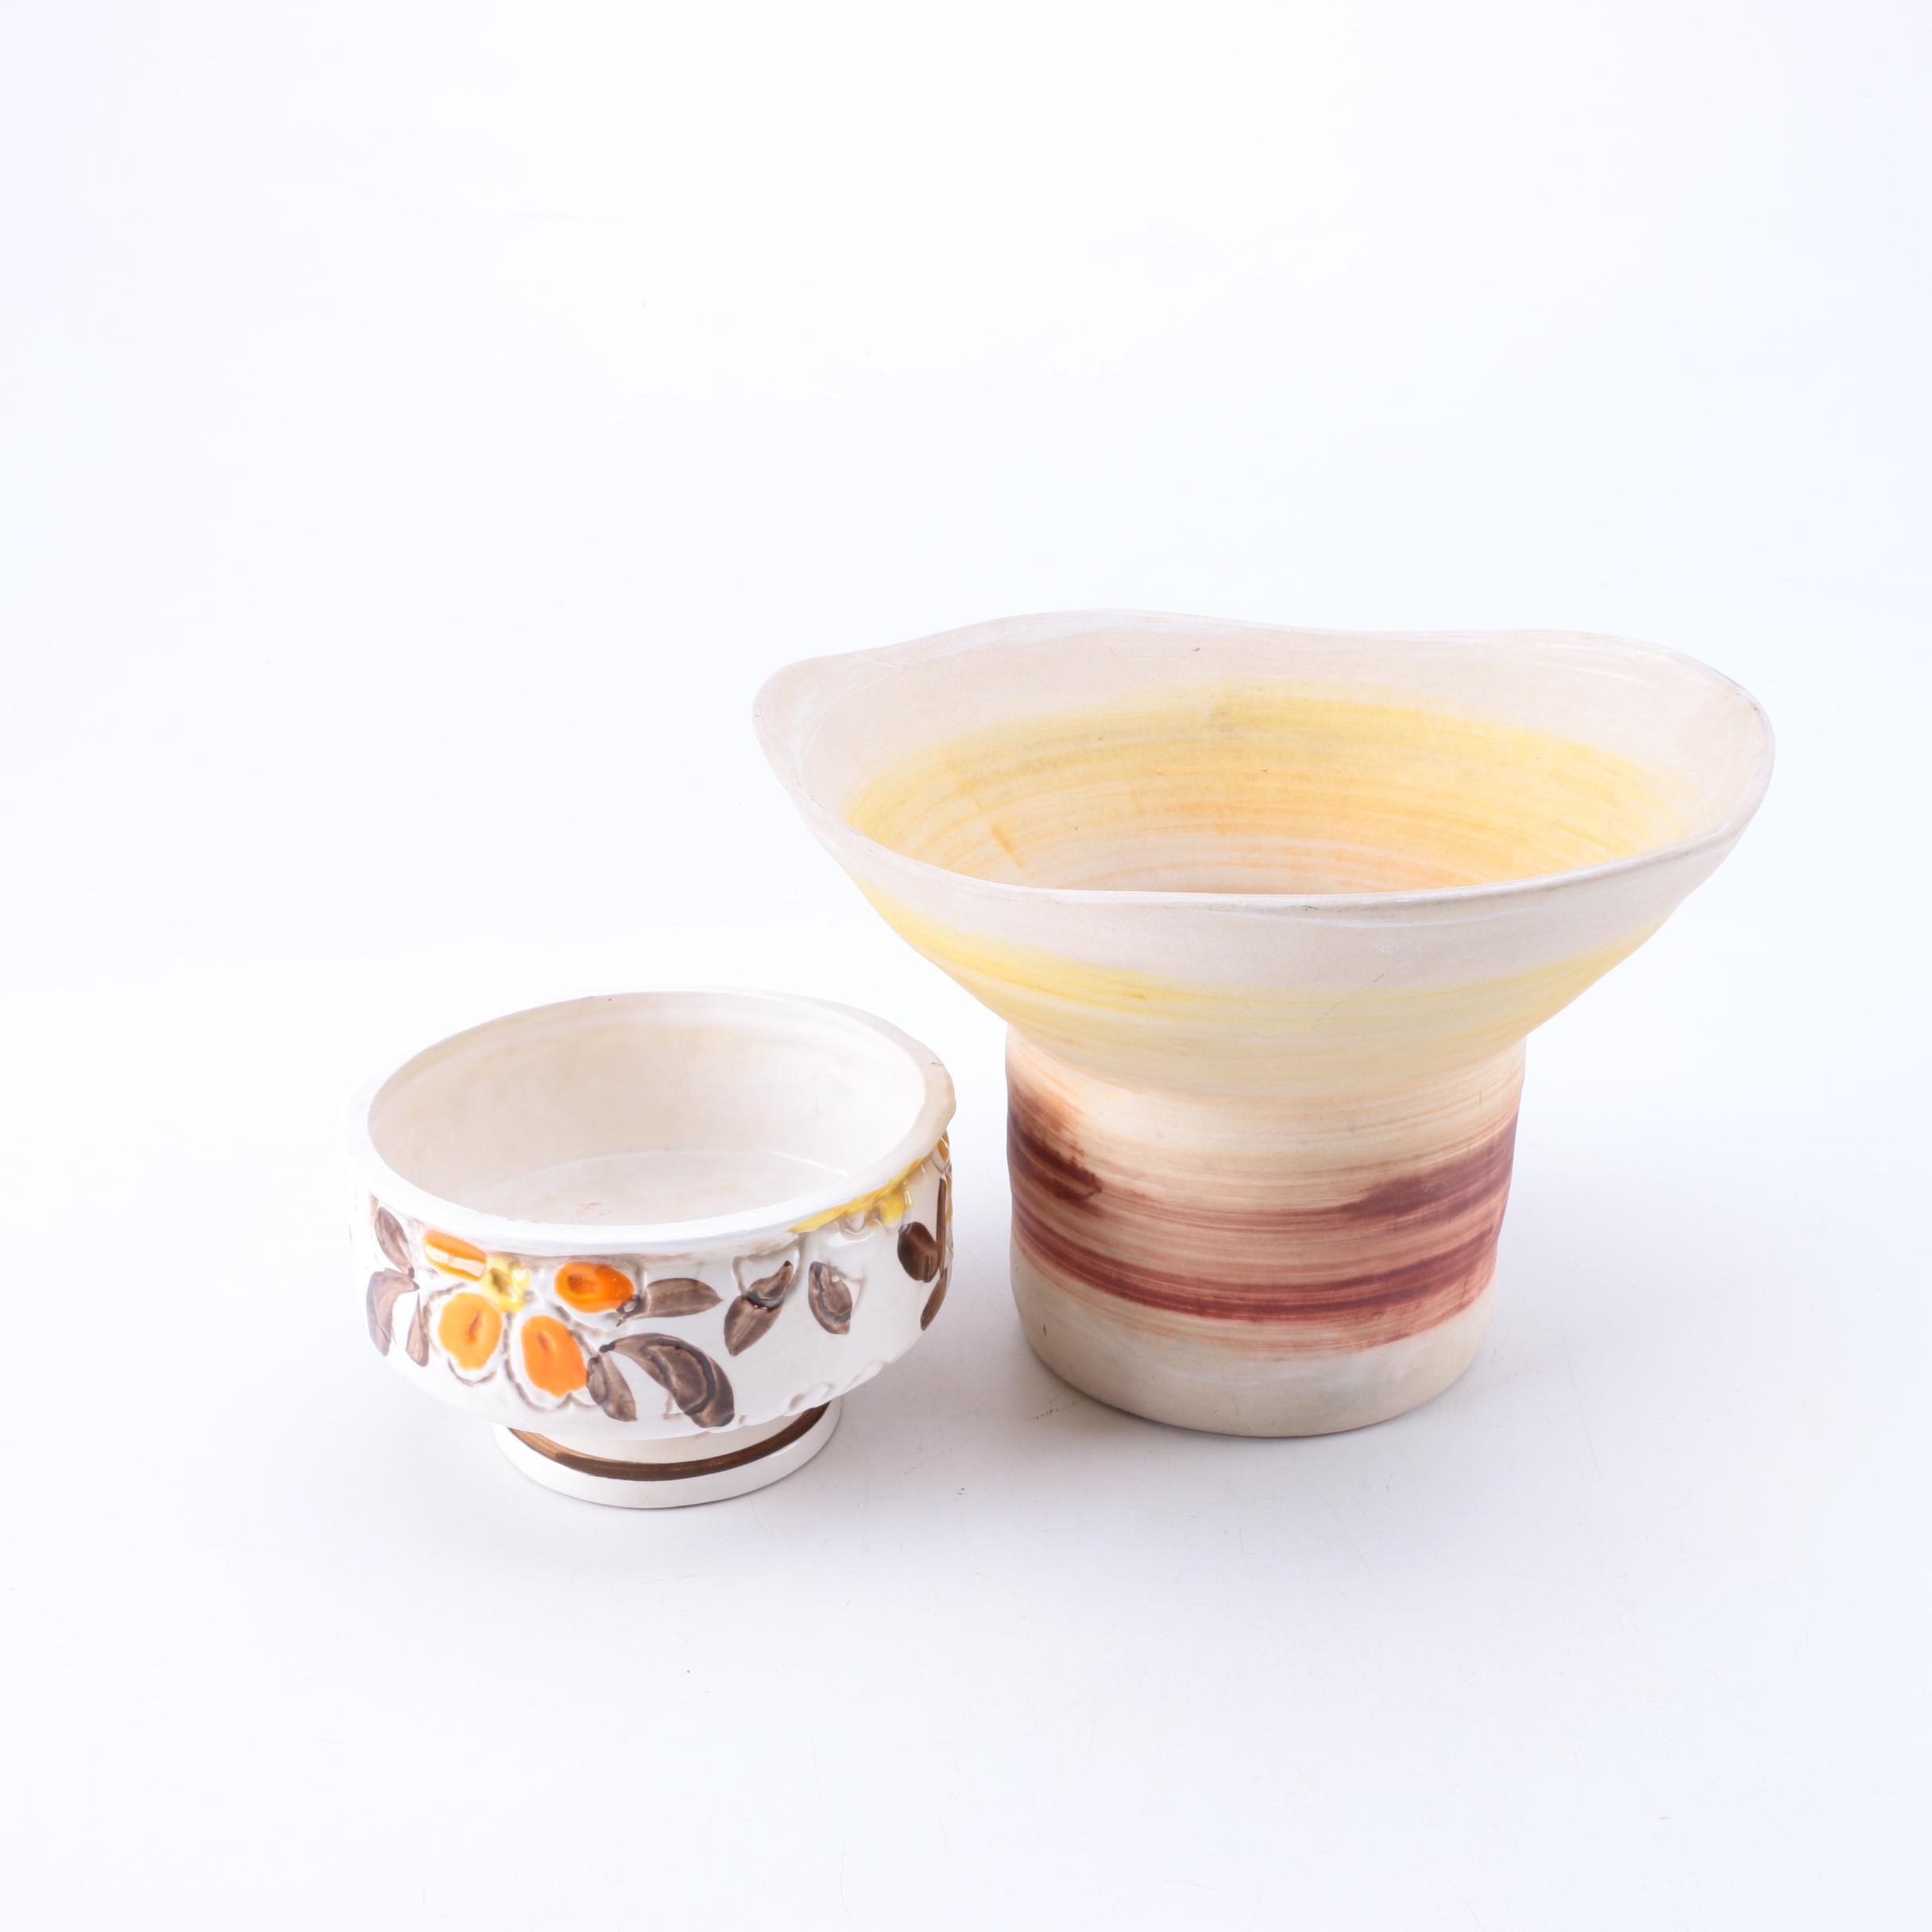 Haeger and Napcoware Bowls